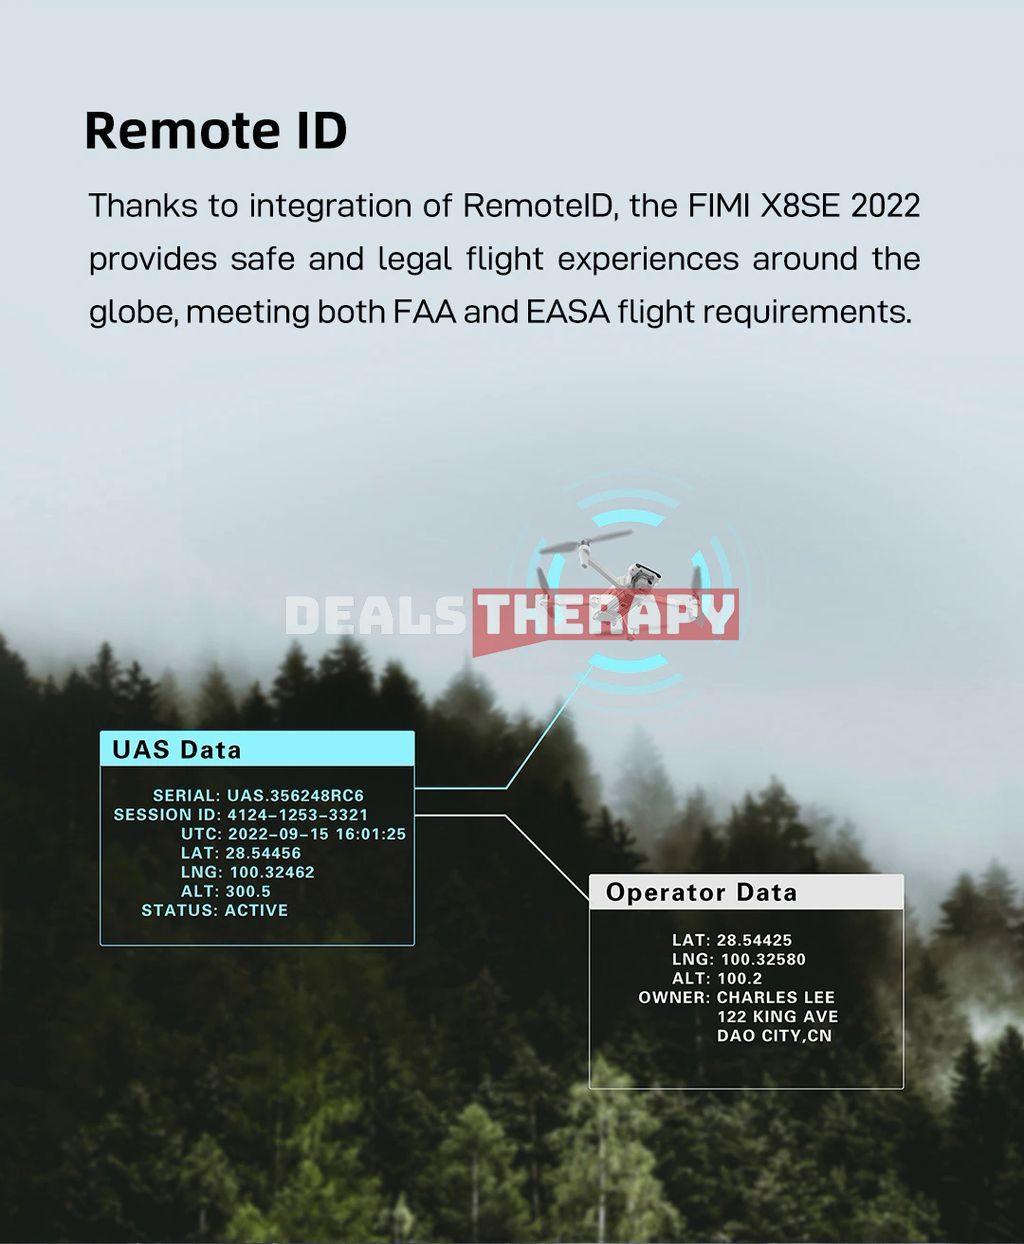 FIMI X8SE 2022